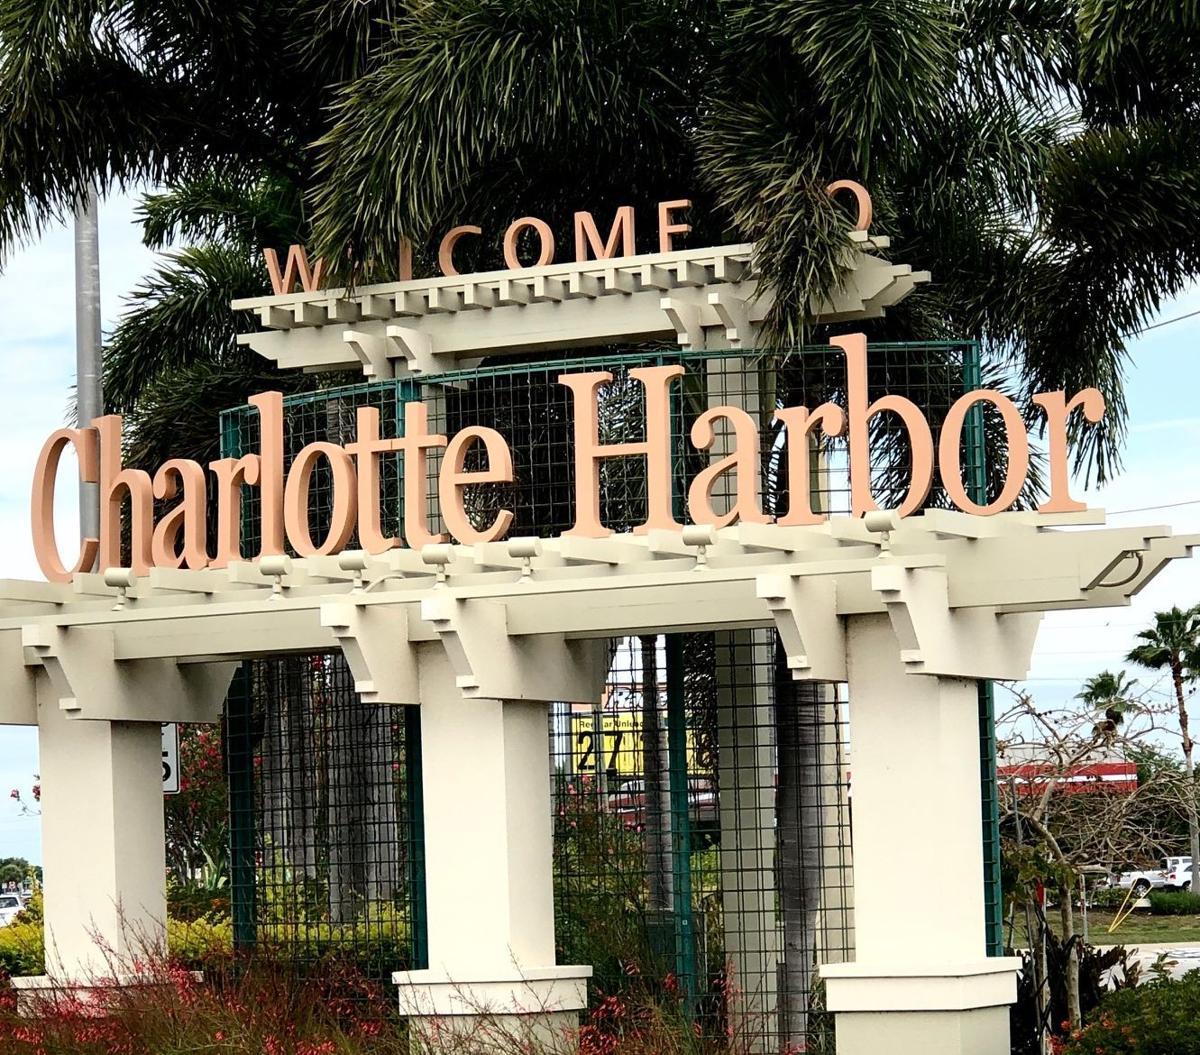 Charlotte Harbor sign